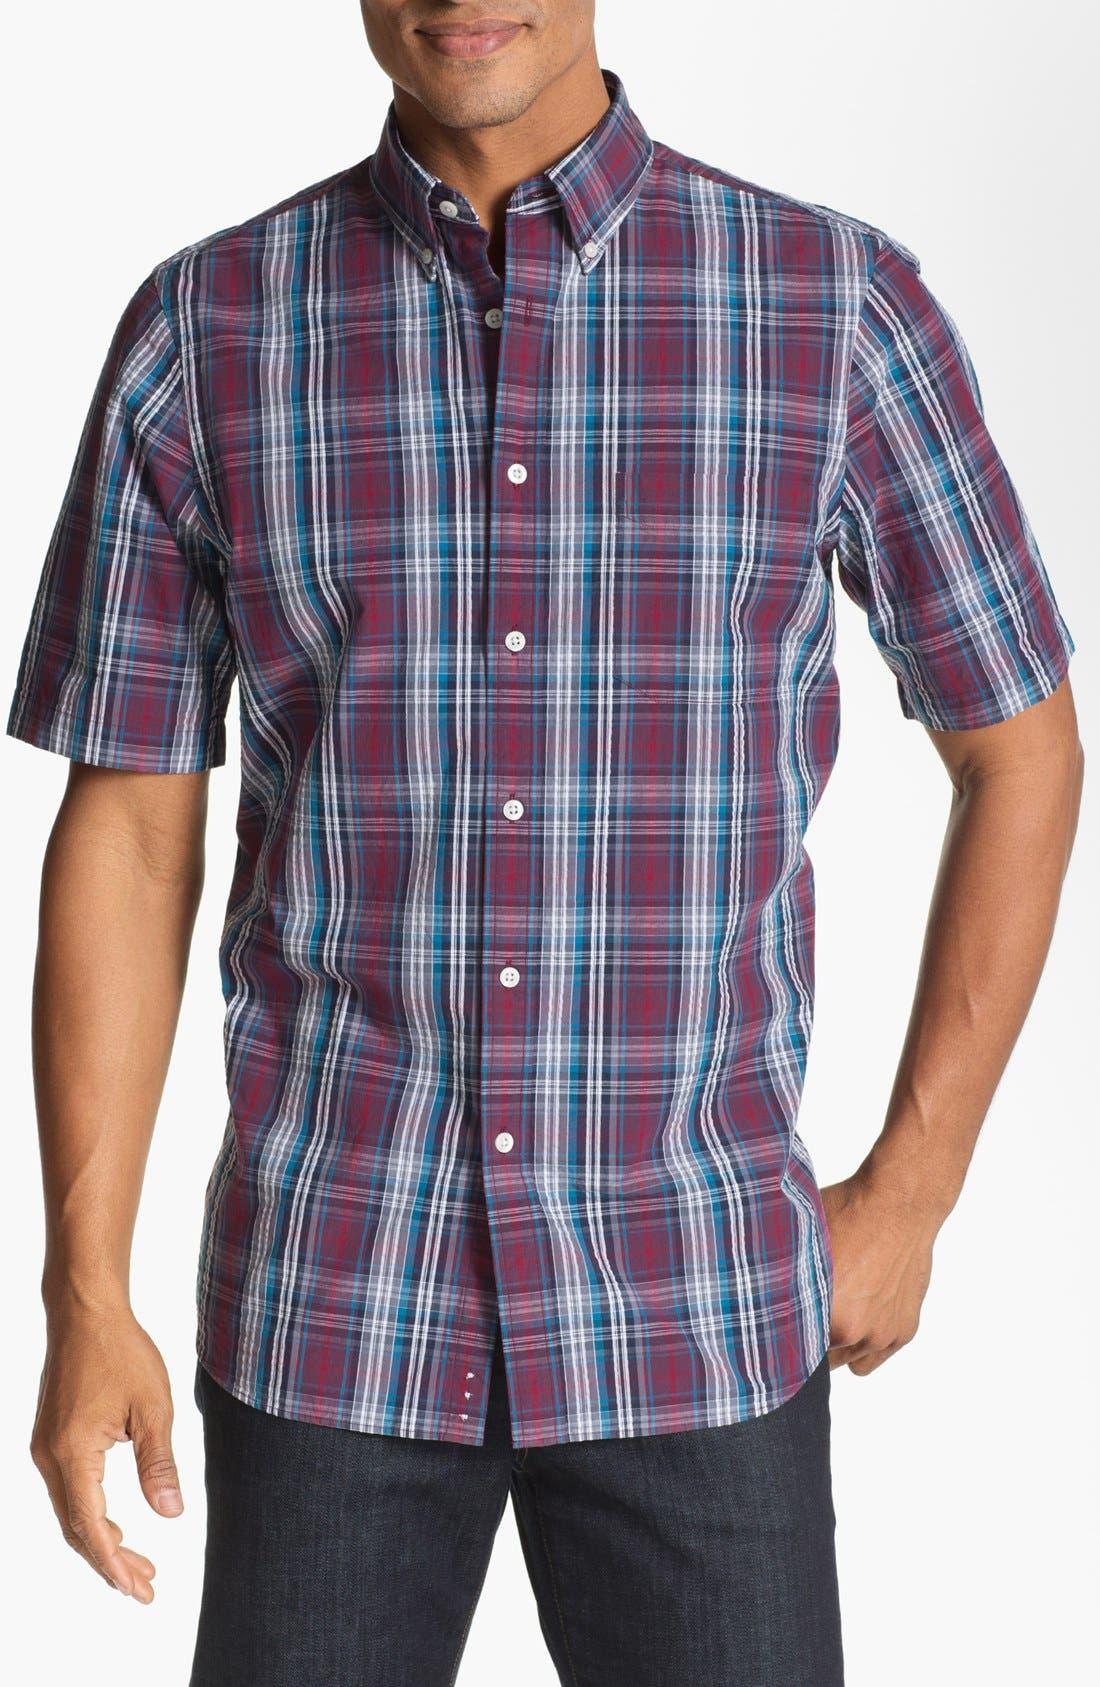 Alternate Image 1 Selected - Nordstrom Regular Fit Seersucker Sport Shirt